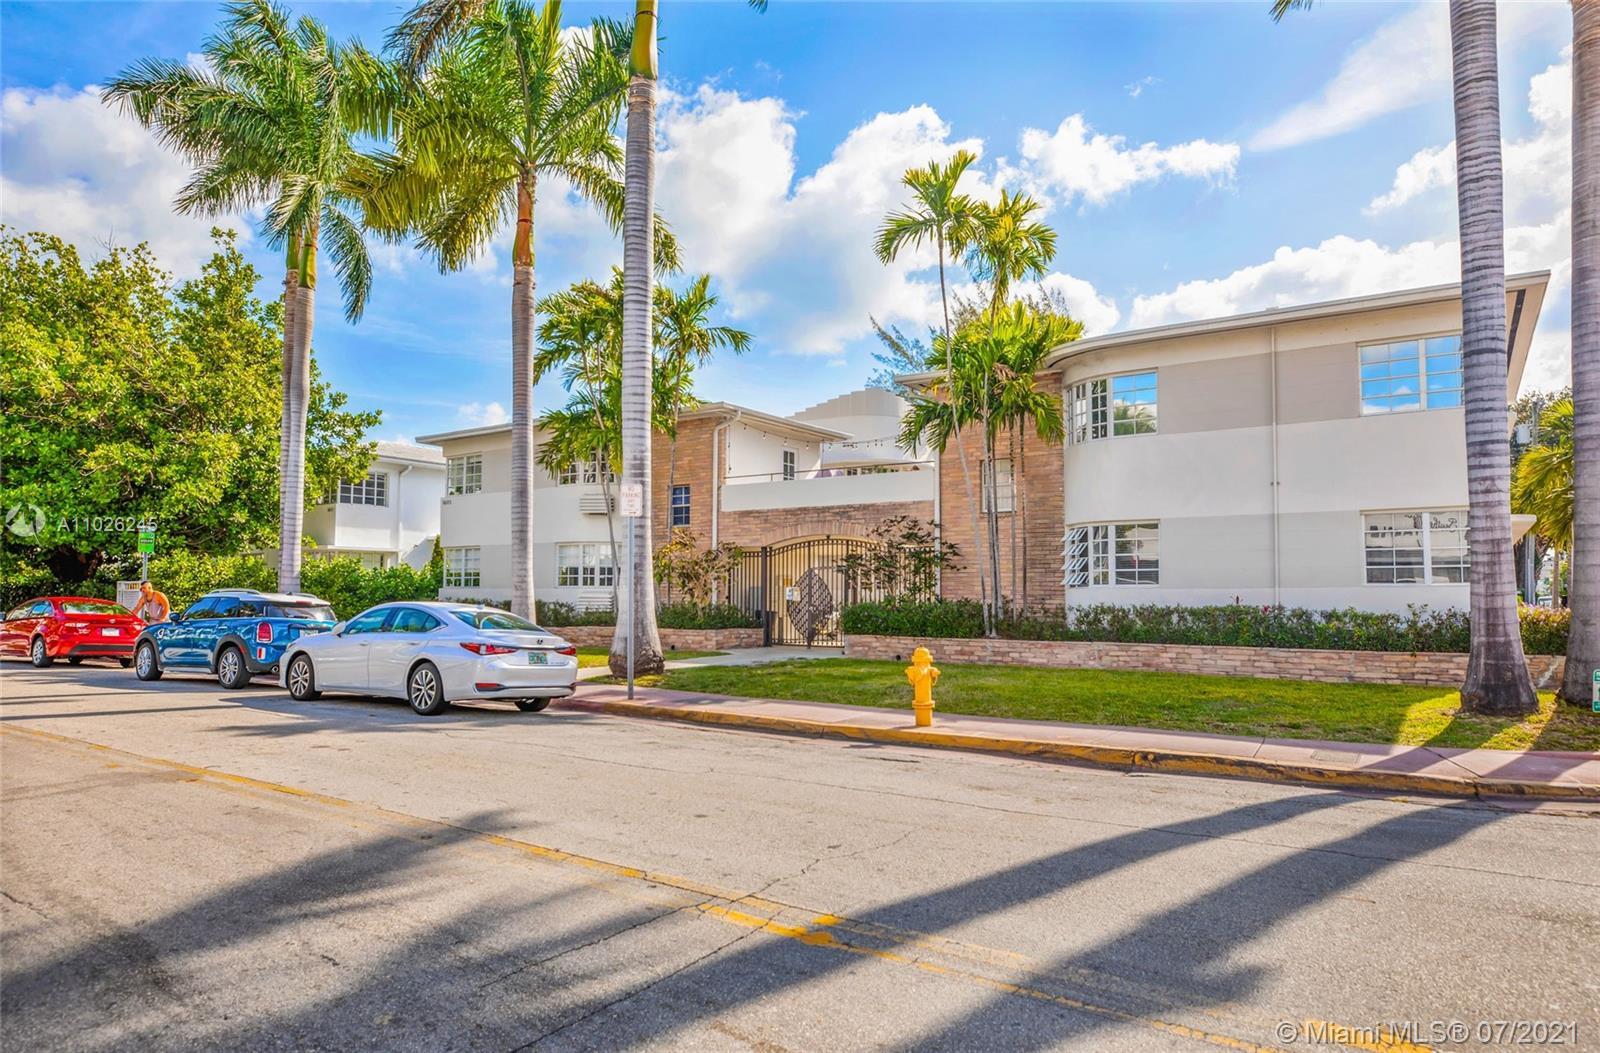 Photo - 1605 Lenox Ave # 7, Miami Beach FL 33139